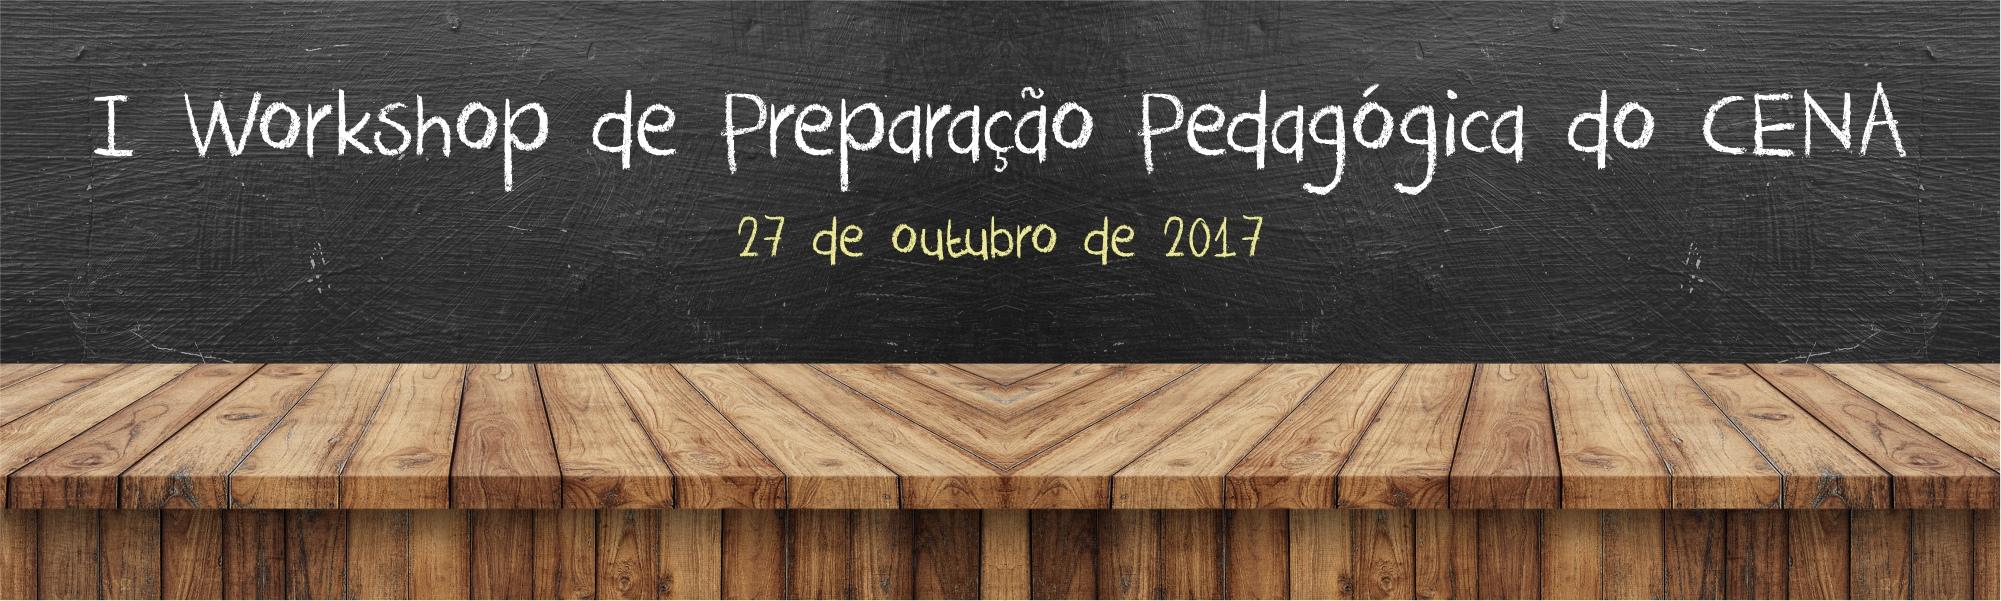 workshop_pedagogico